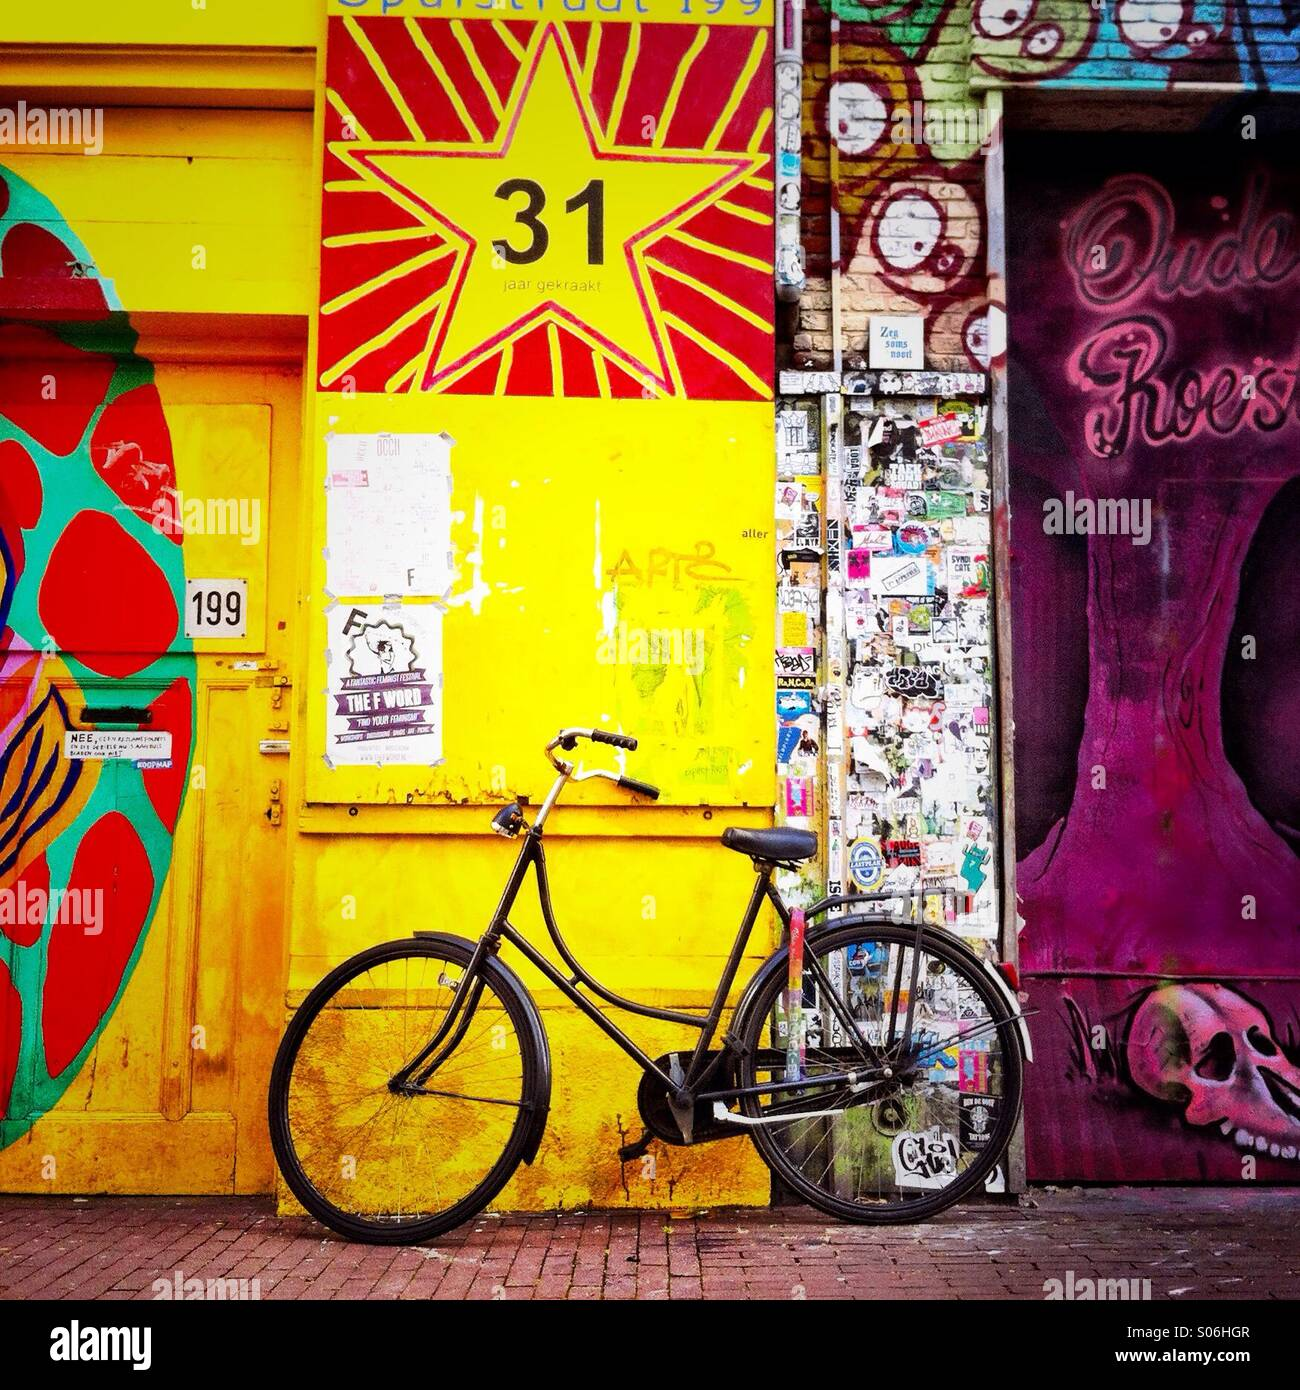 Graffiti wall amsterdam - A Bike Leaning Against A Wall With Graffiti On It Amsterdam The Netherlands Europe